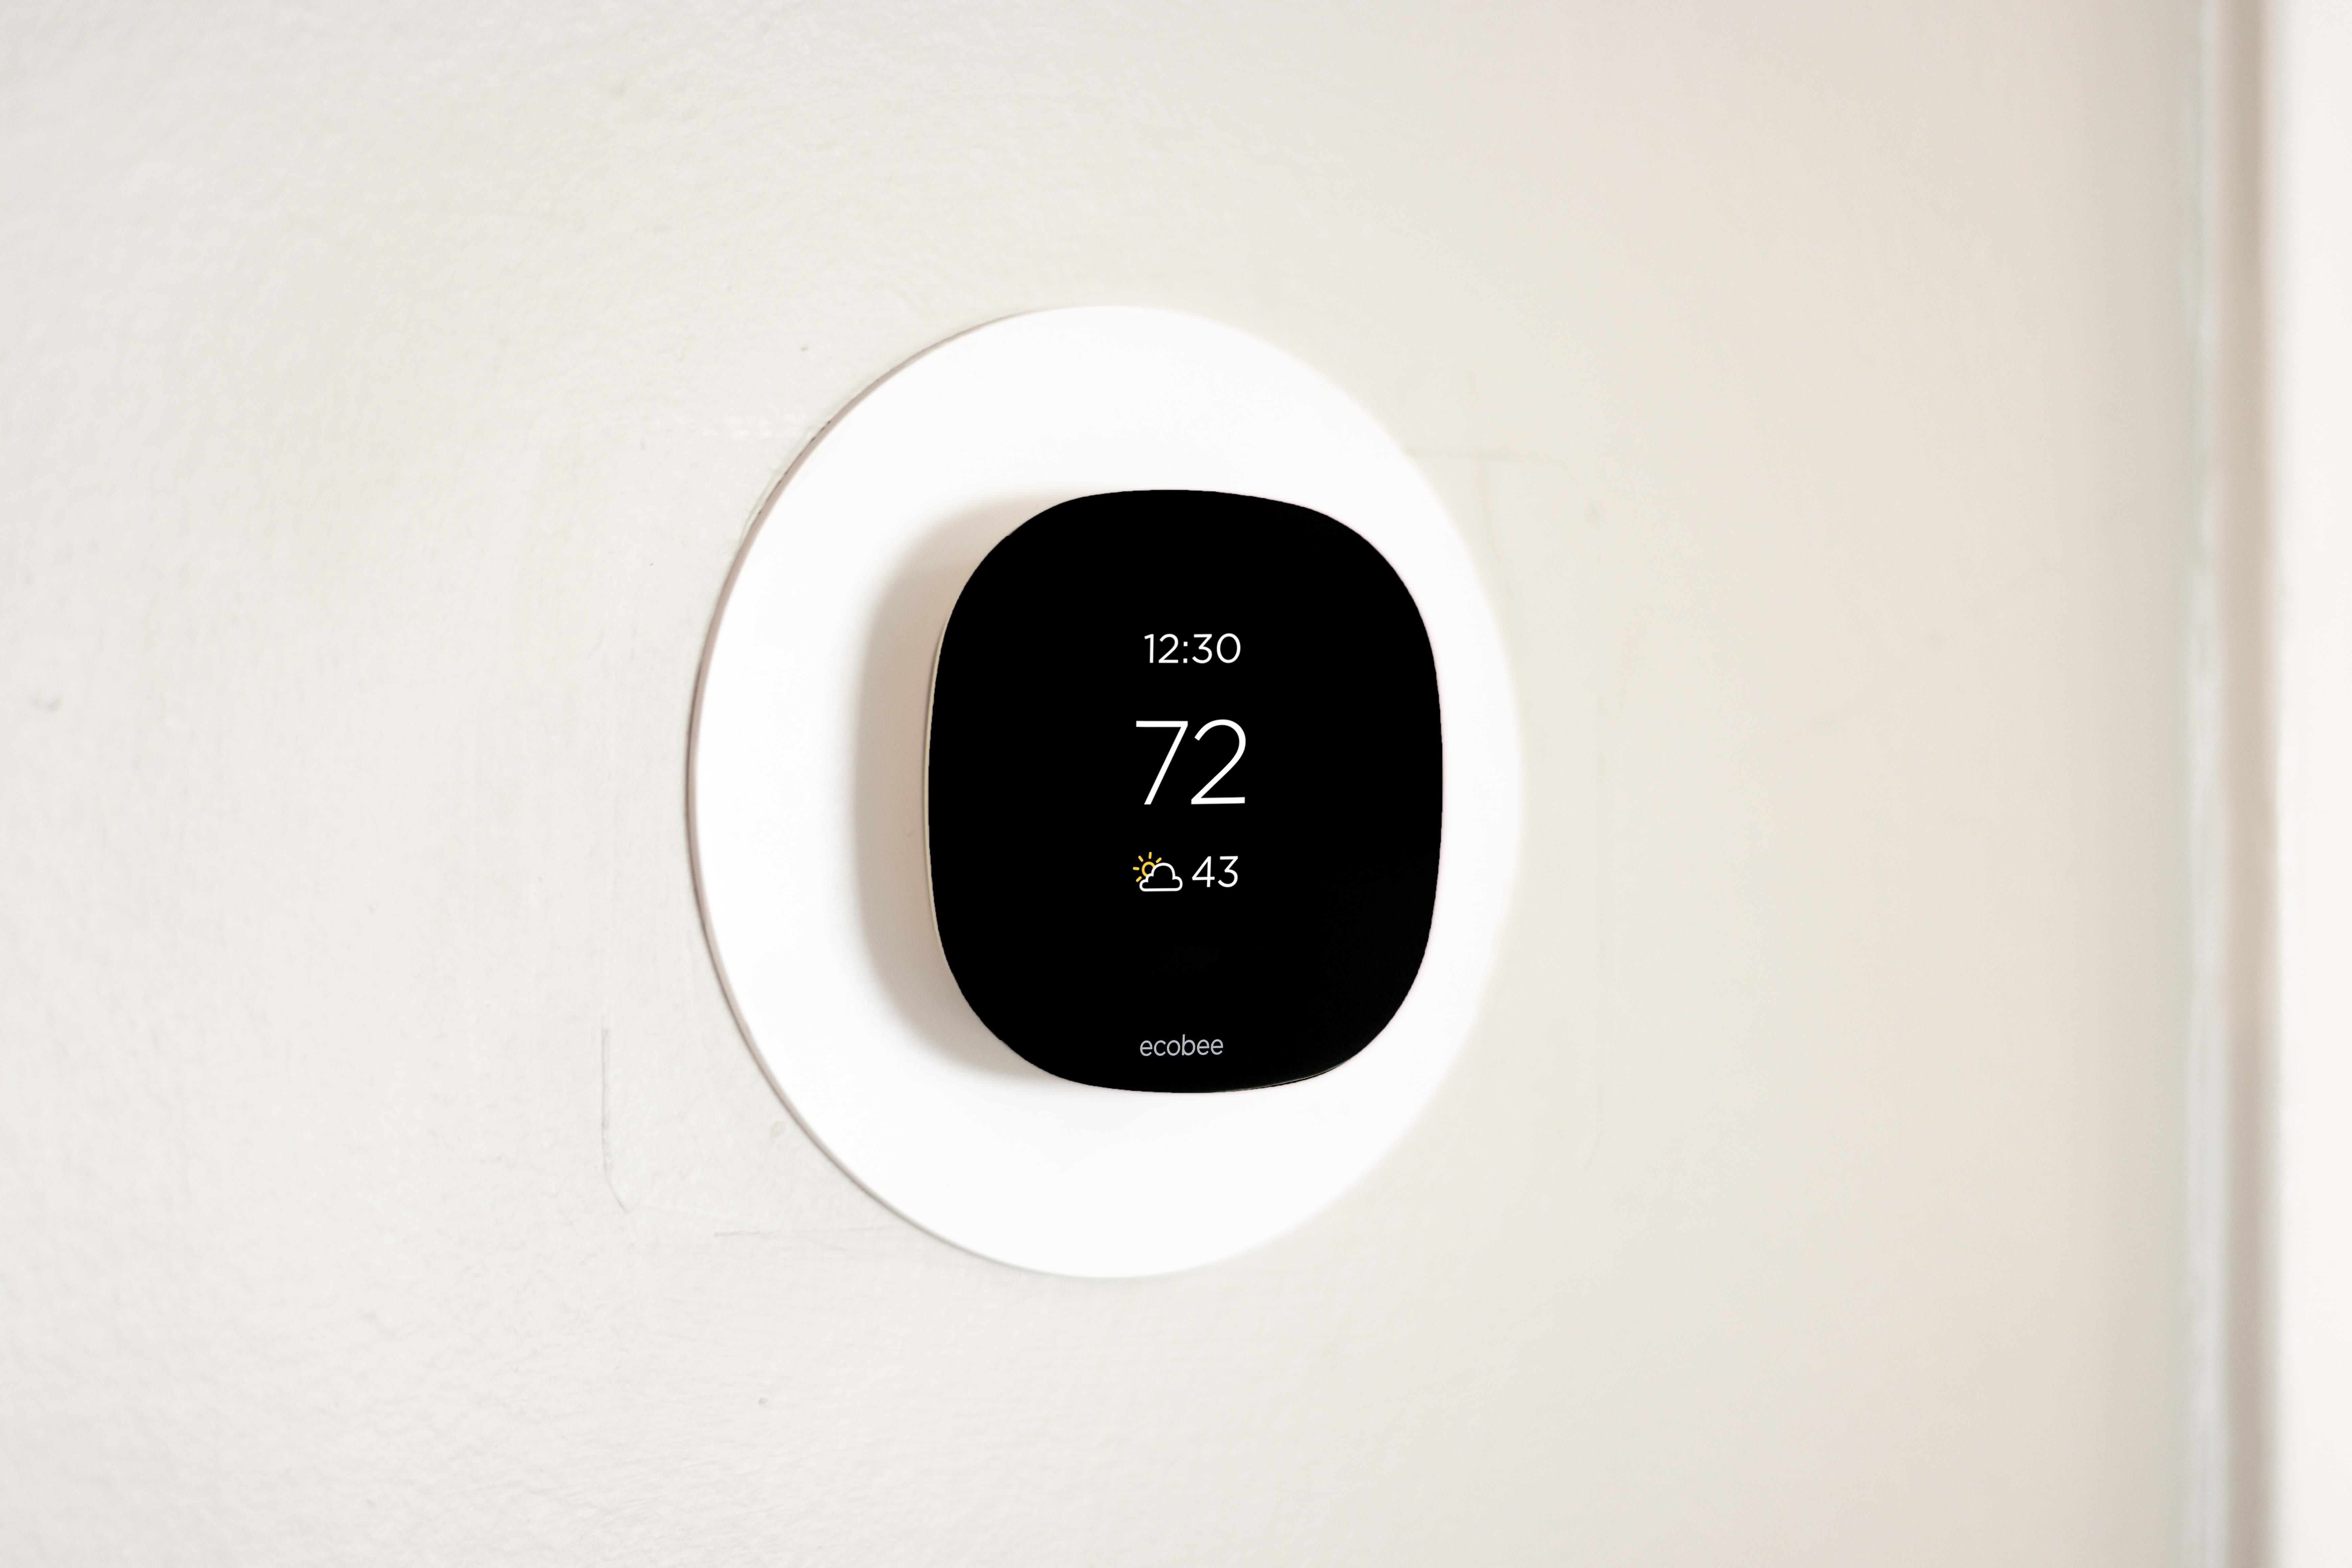 Nest thermostat at Regency Pointe in Forestville, Maryland